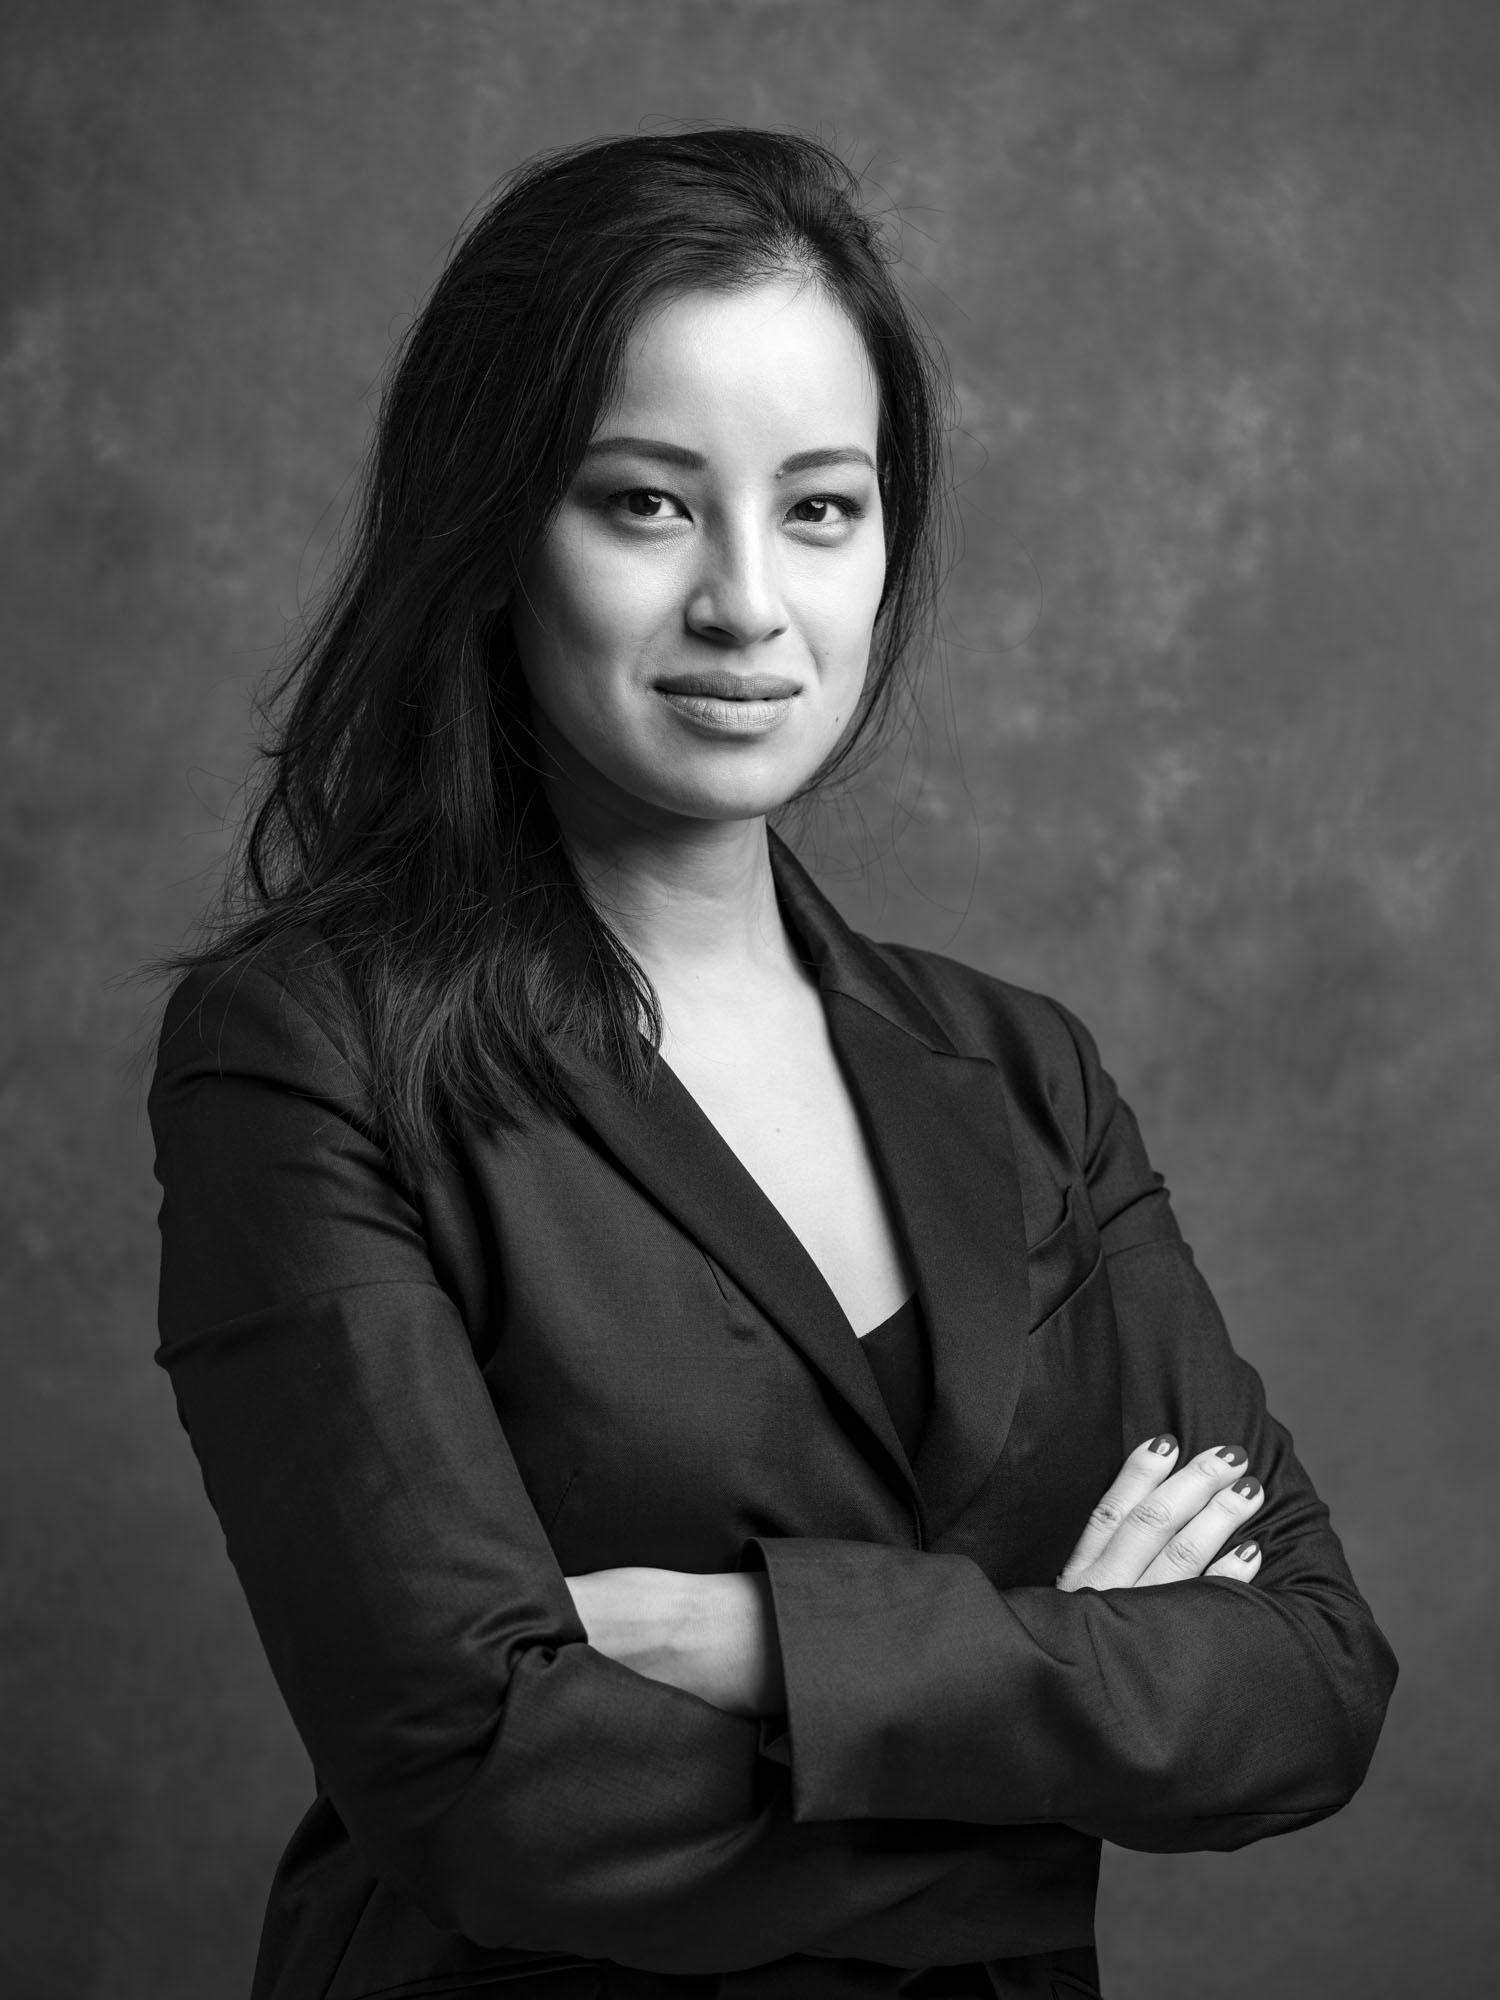 Corporate headshot portrait linkedin profil photography studio singapore services asia photographer woman black and white